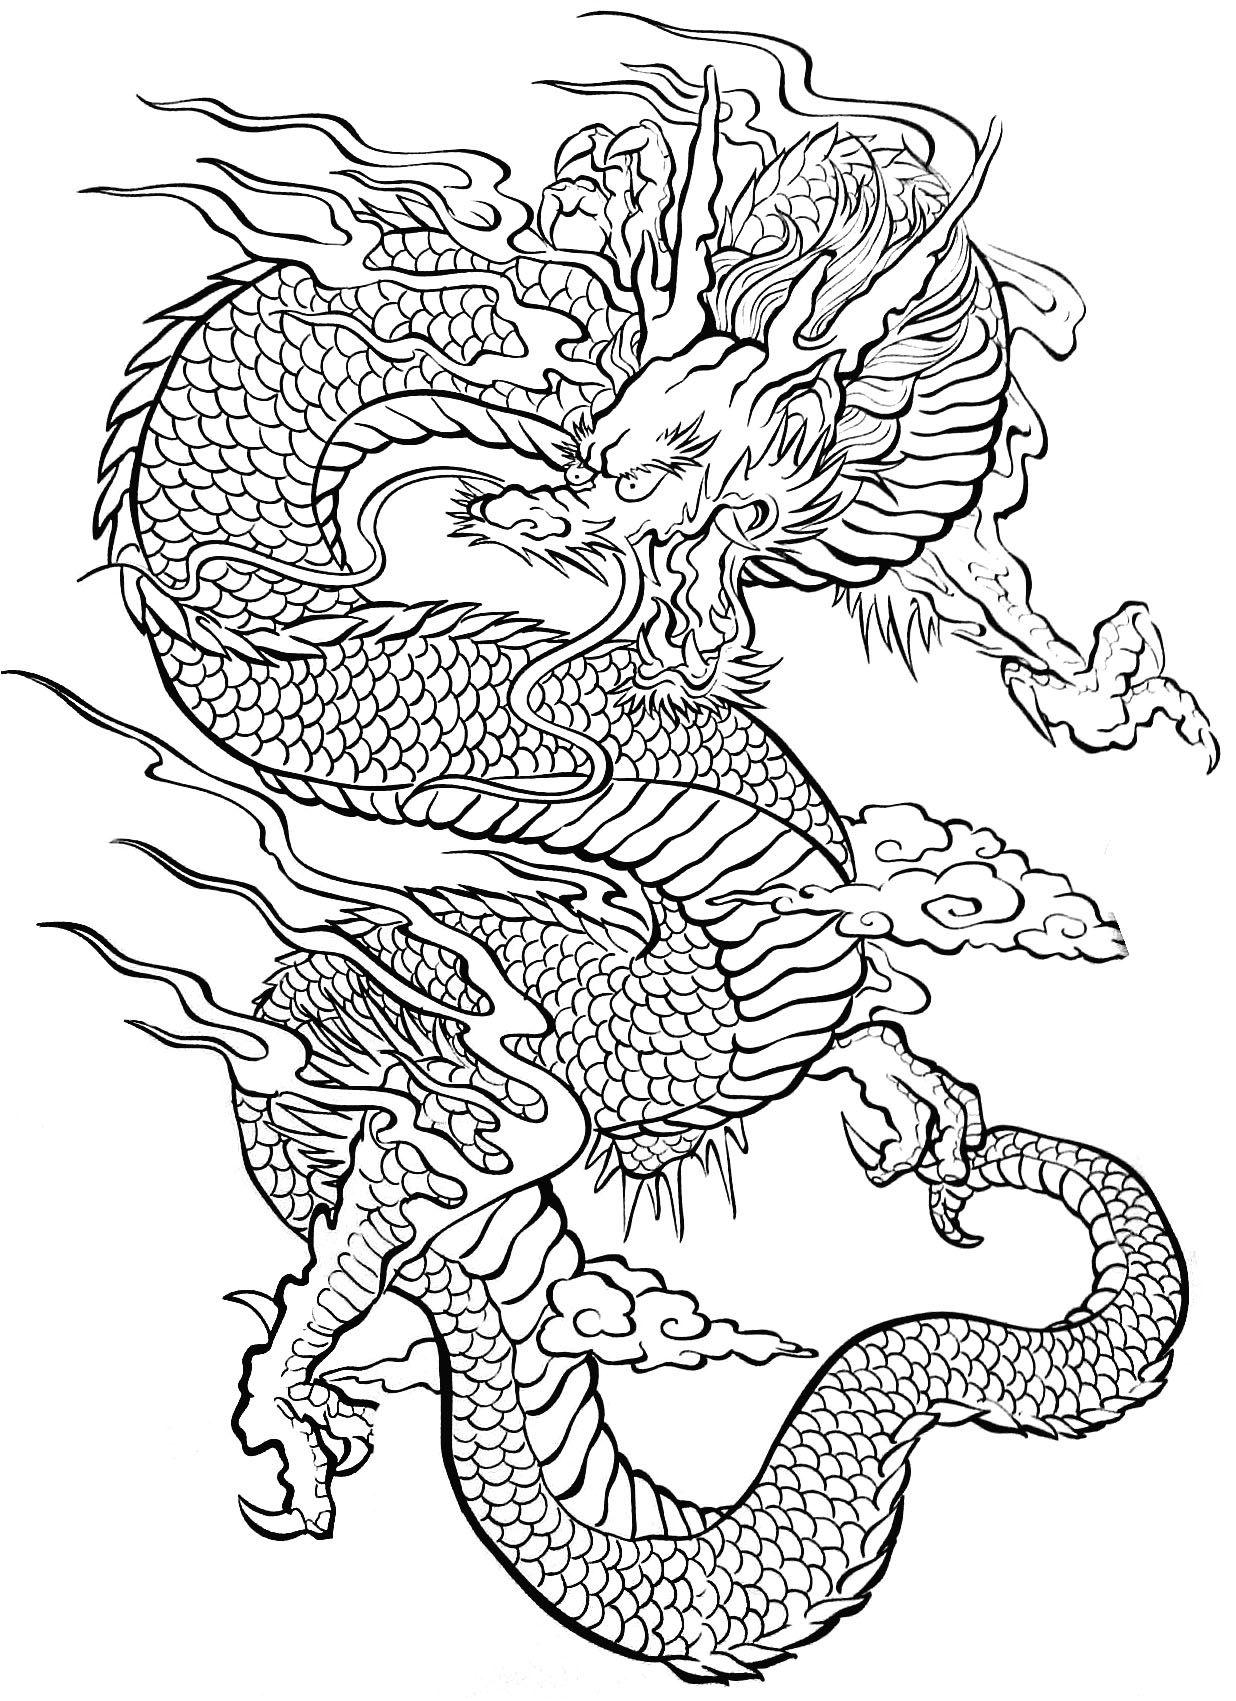 Asian dragon tattoo, Dragon tattoo drawing, Dragon coloring page